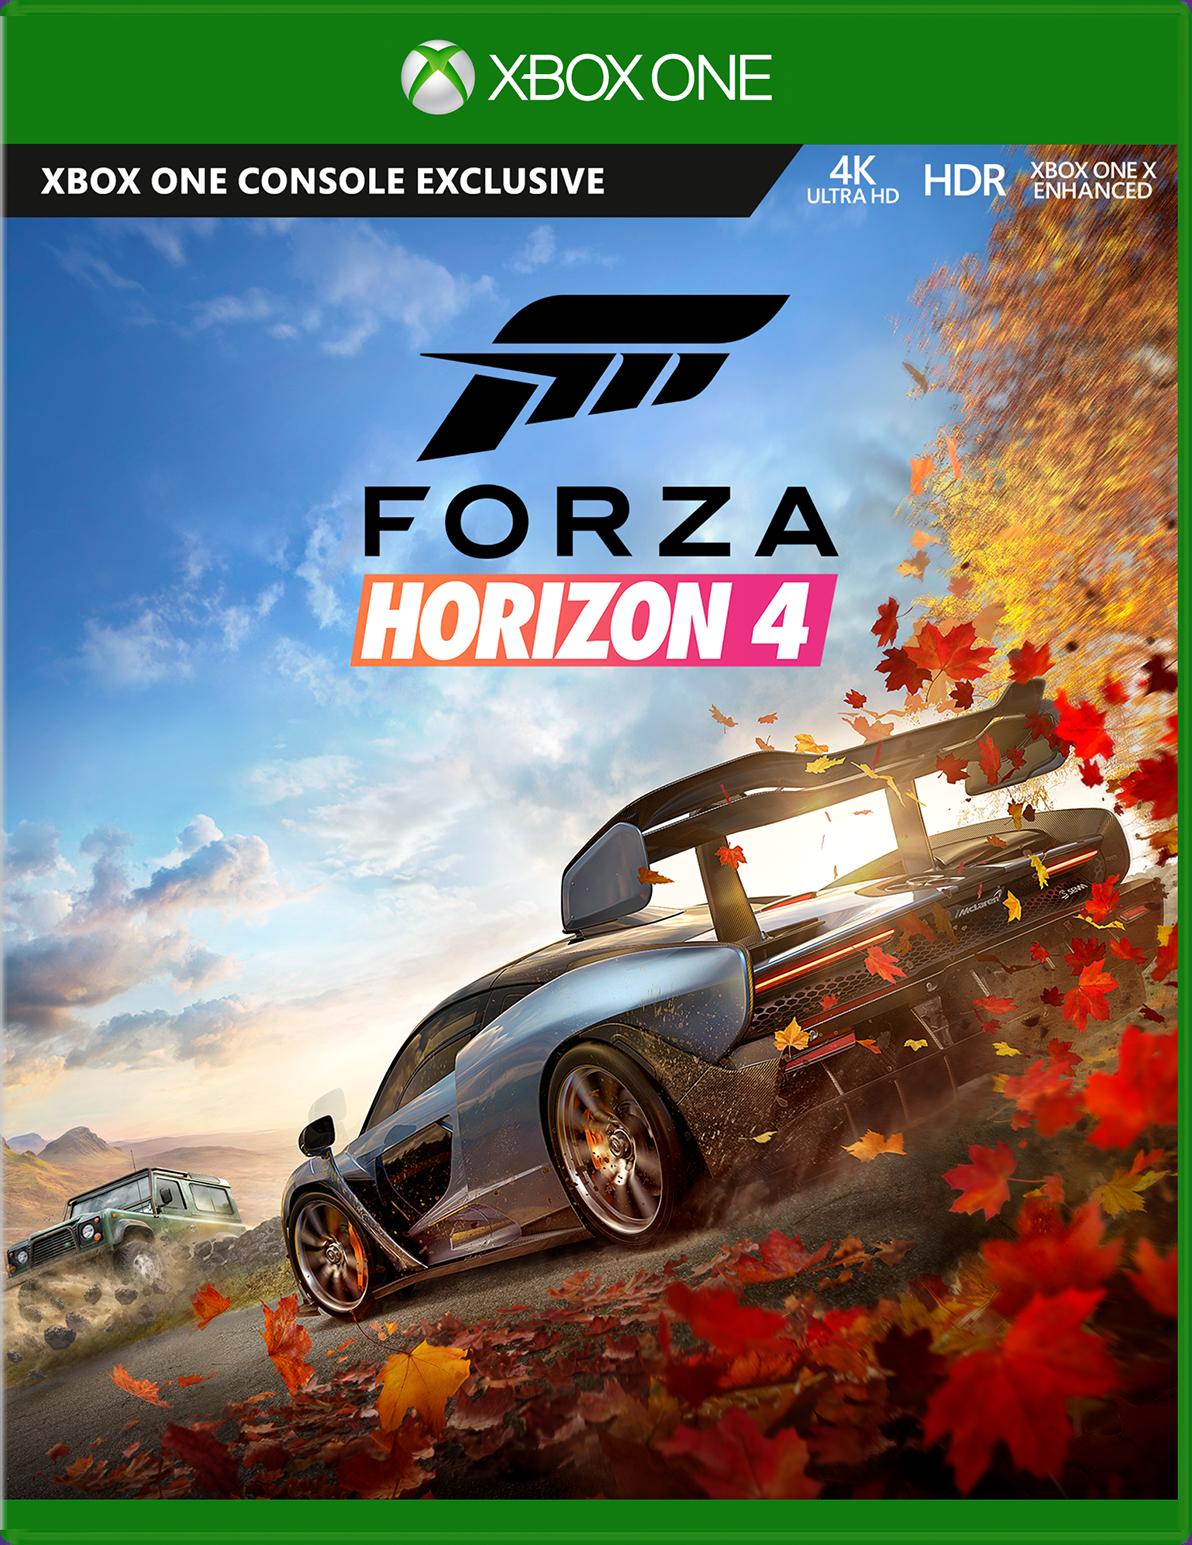 Buy Forza Horizon 4 for Xbox One - Microsoft Store